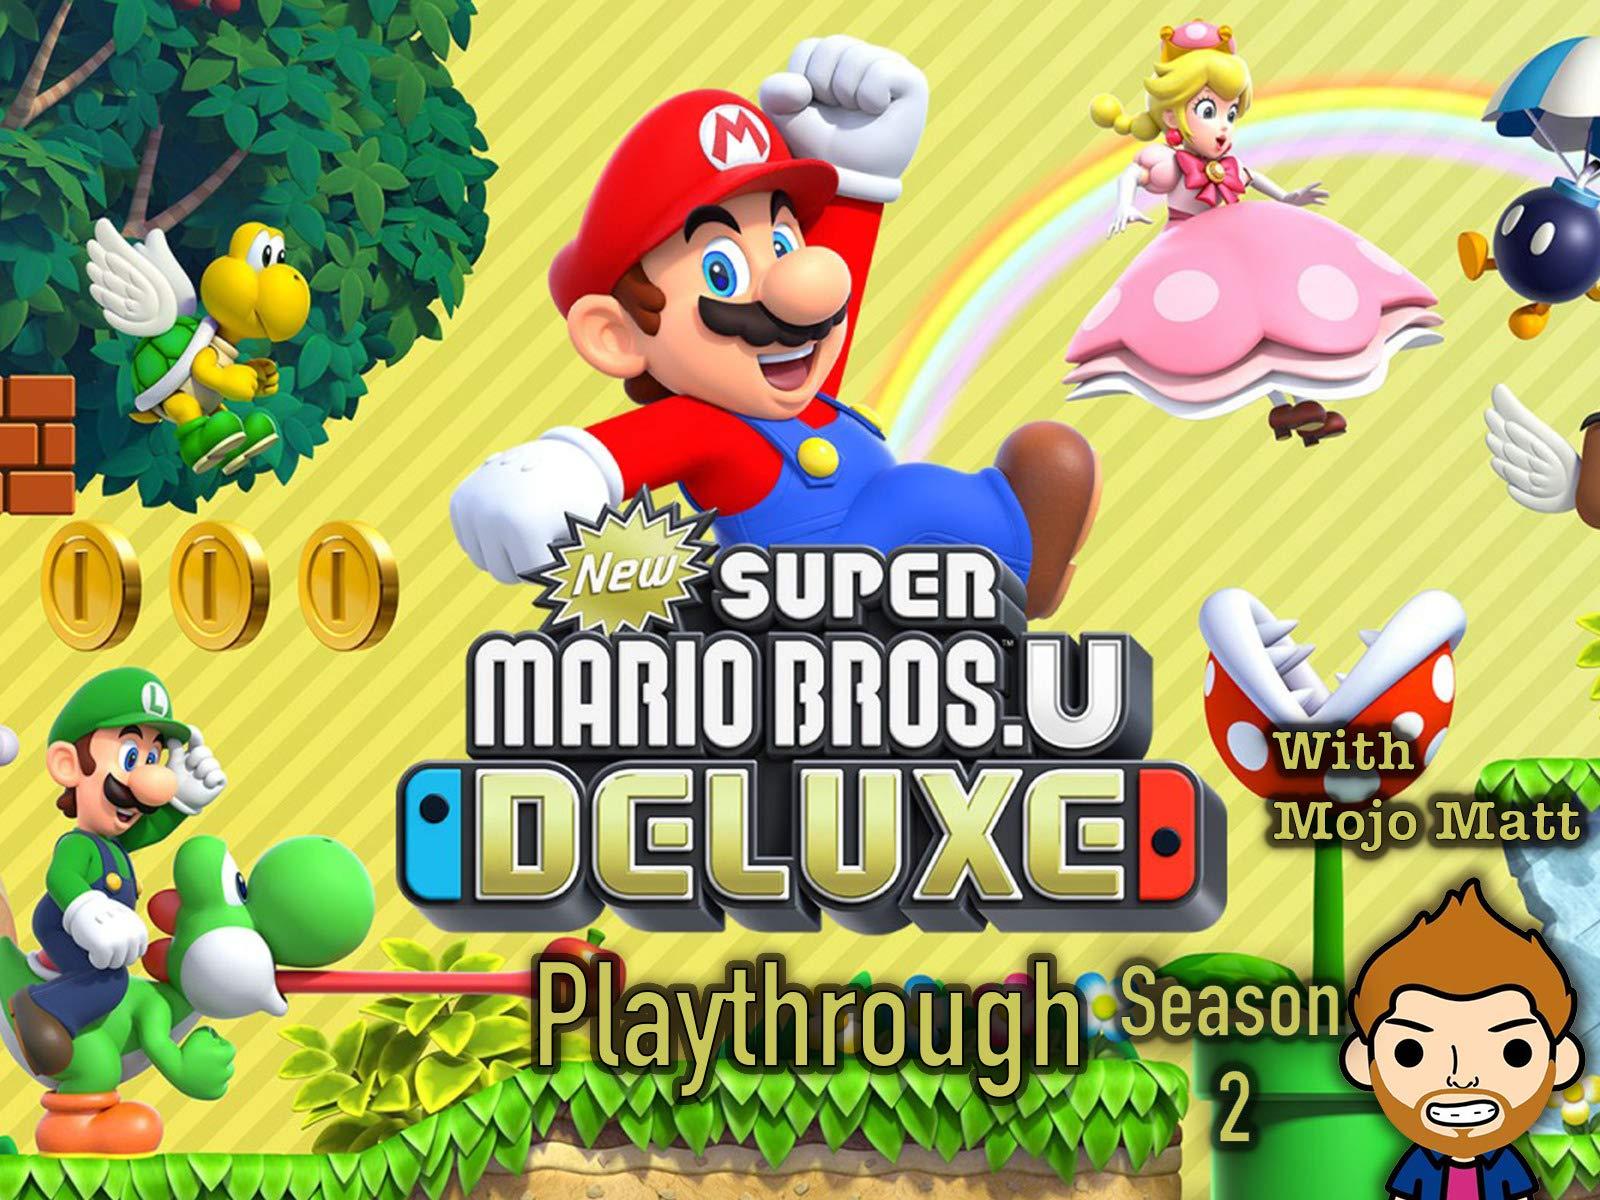 New Super Mario Bros. U Deluxe Playthrough With Mojo Matt - Season 2